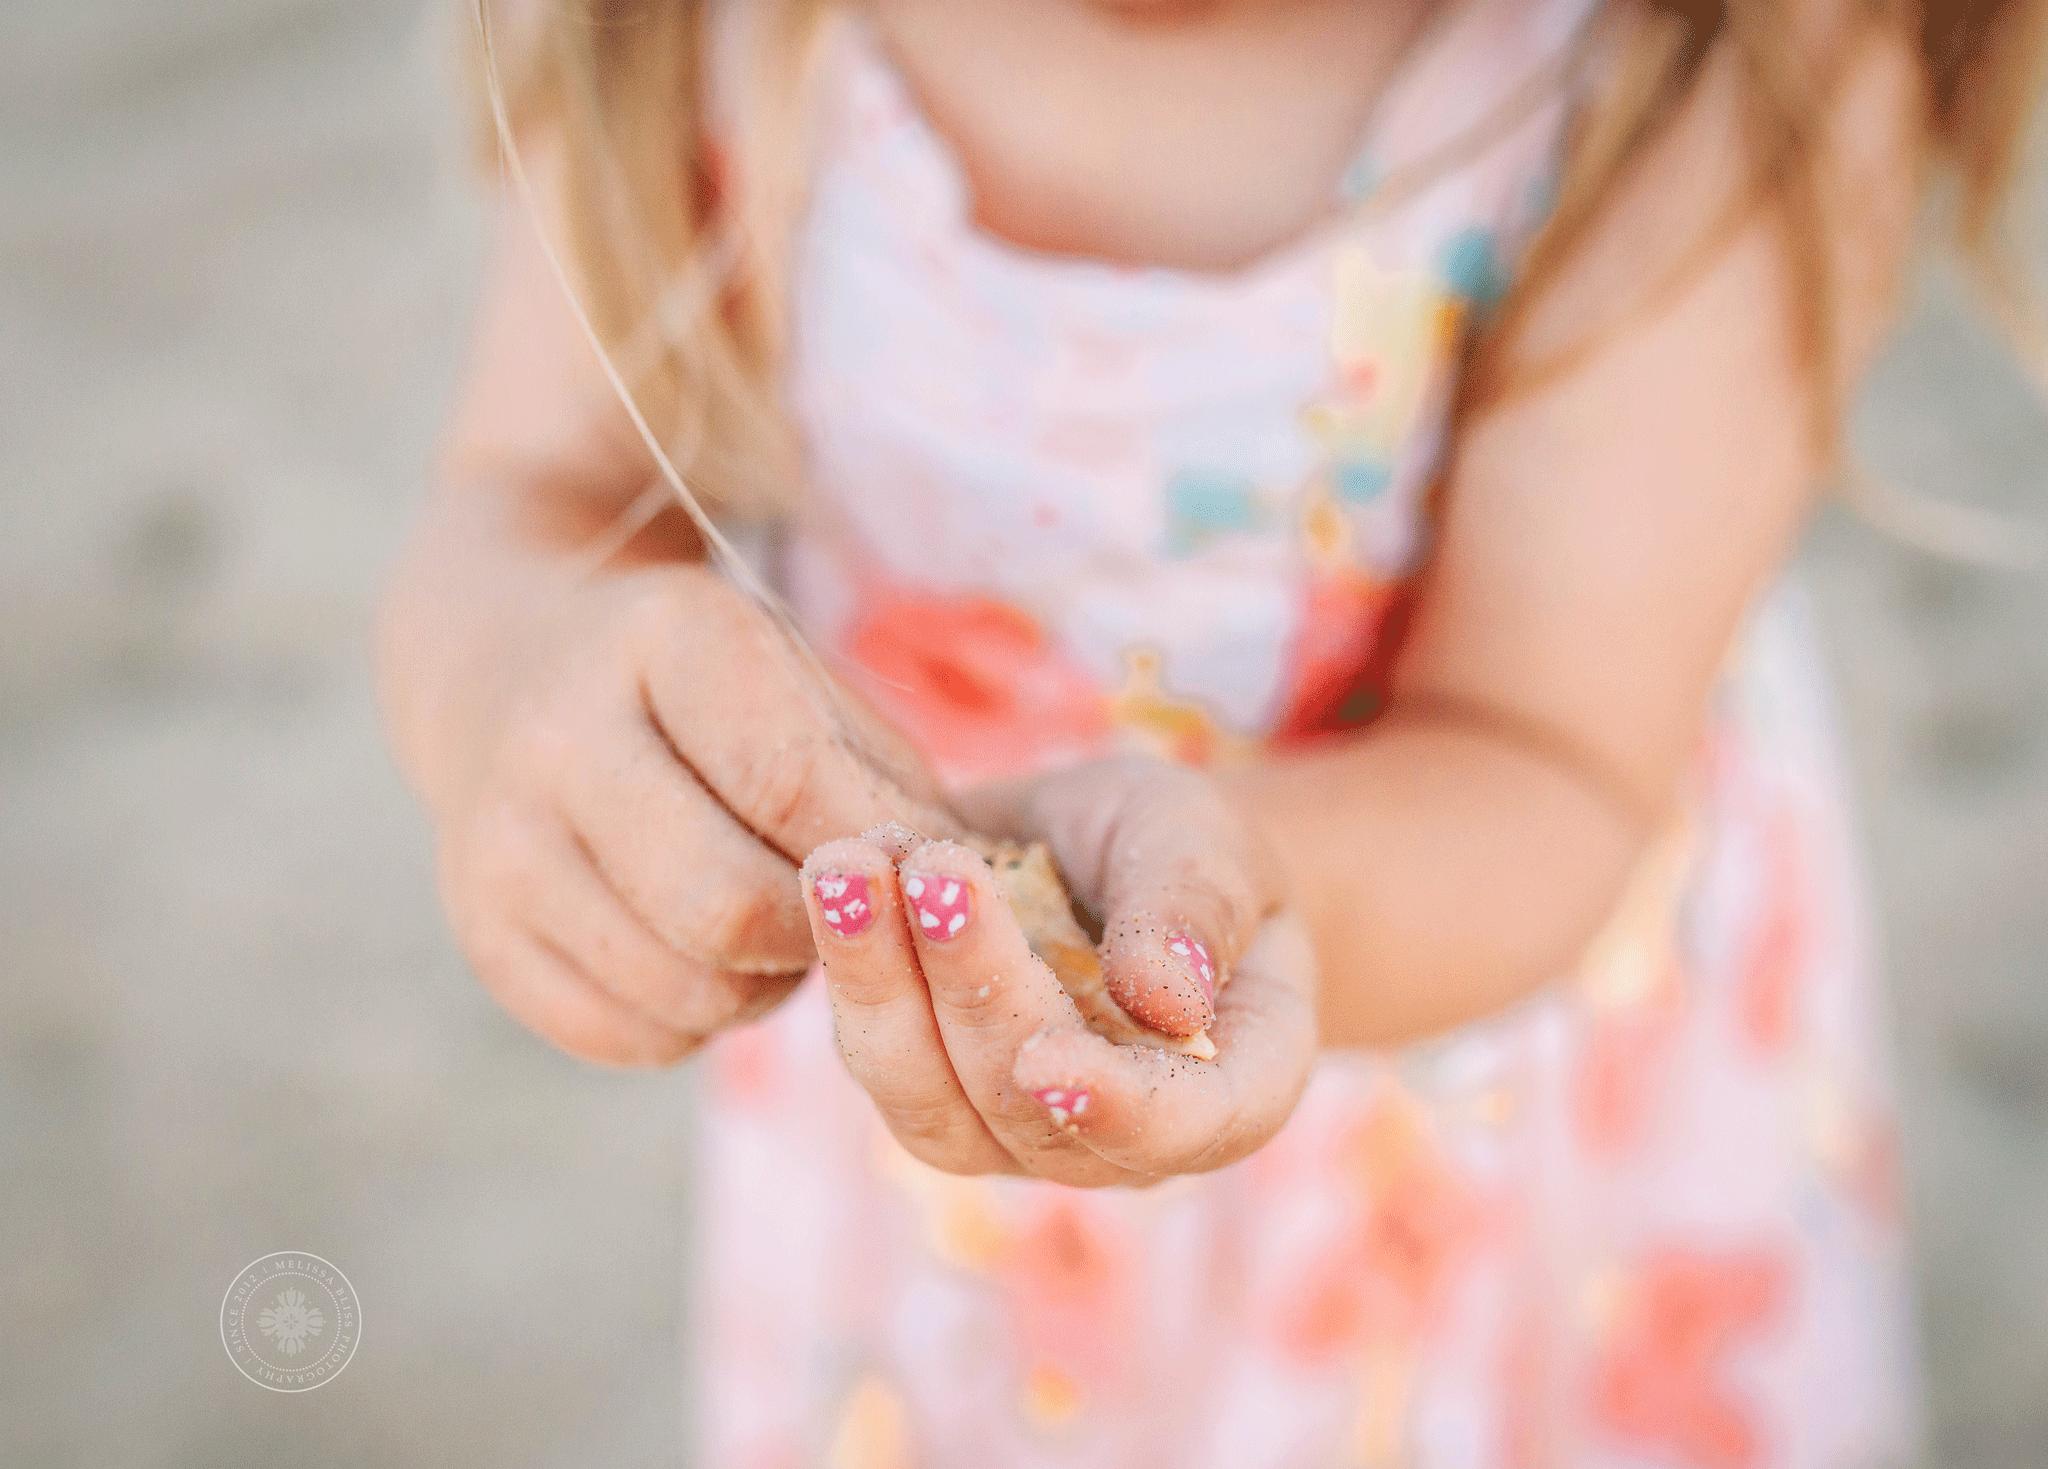 collecting-seashells-melissa-bliss-photography-virginia-beach-norfolk-porstmouth-sandbridge-beach-photographers.png